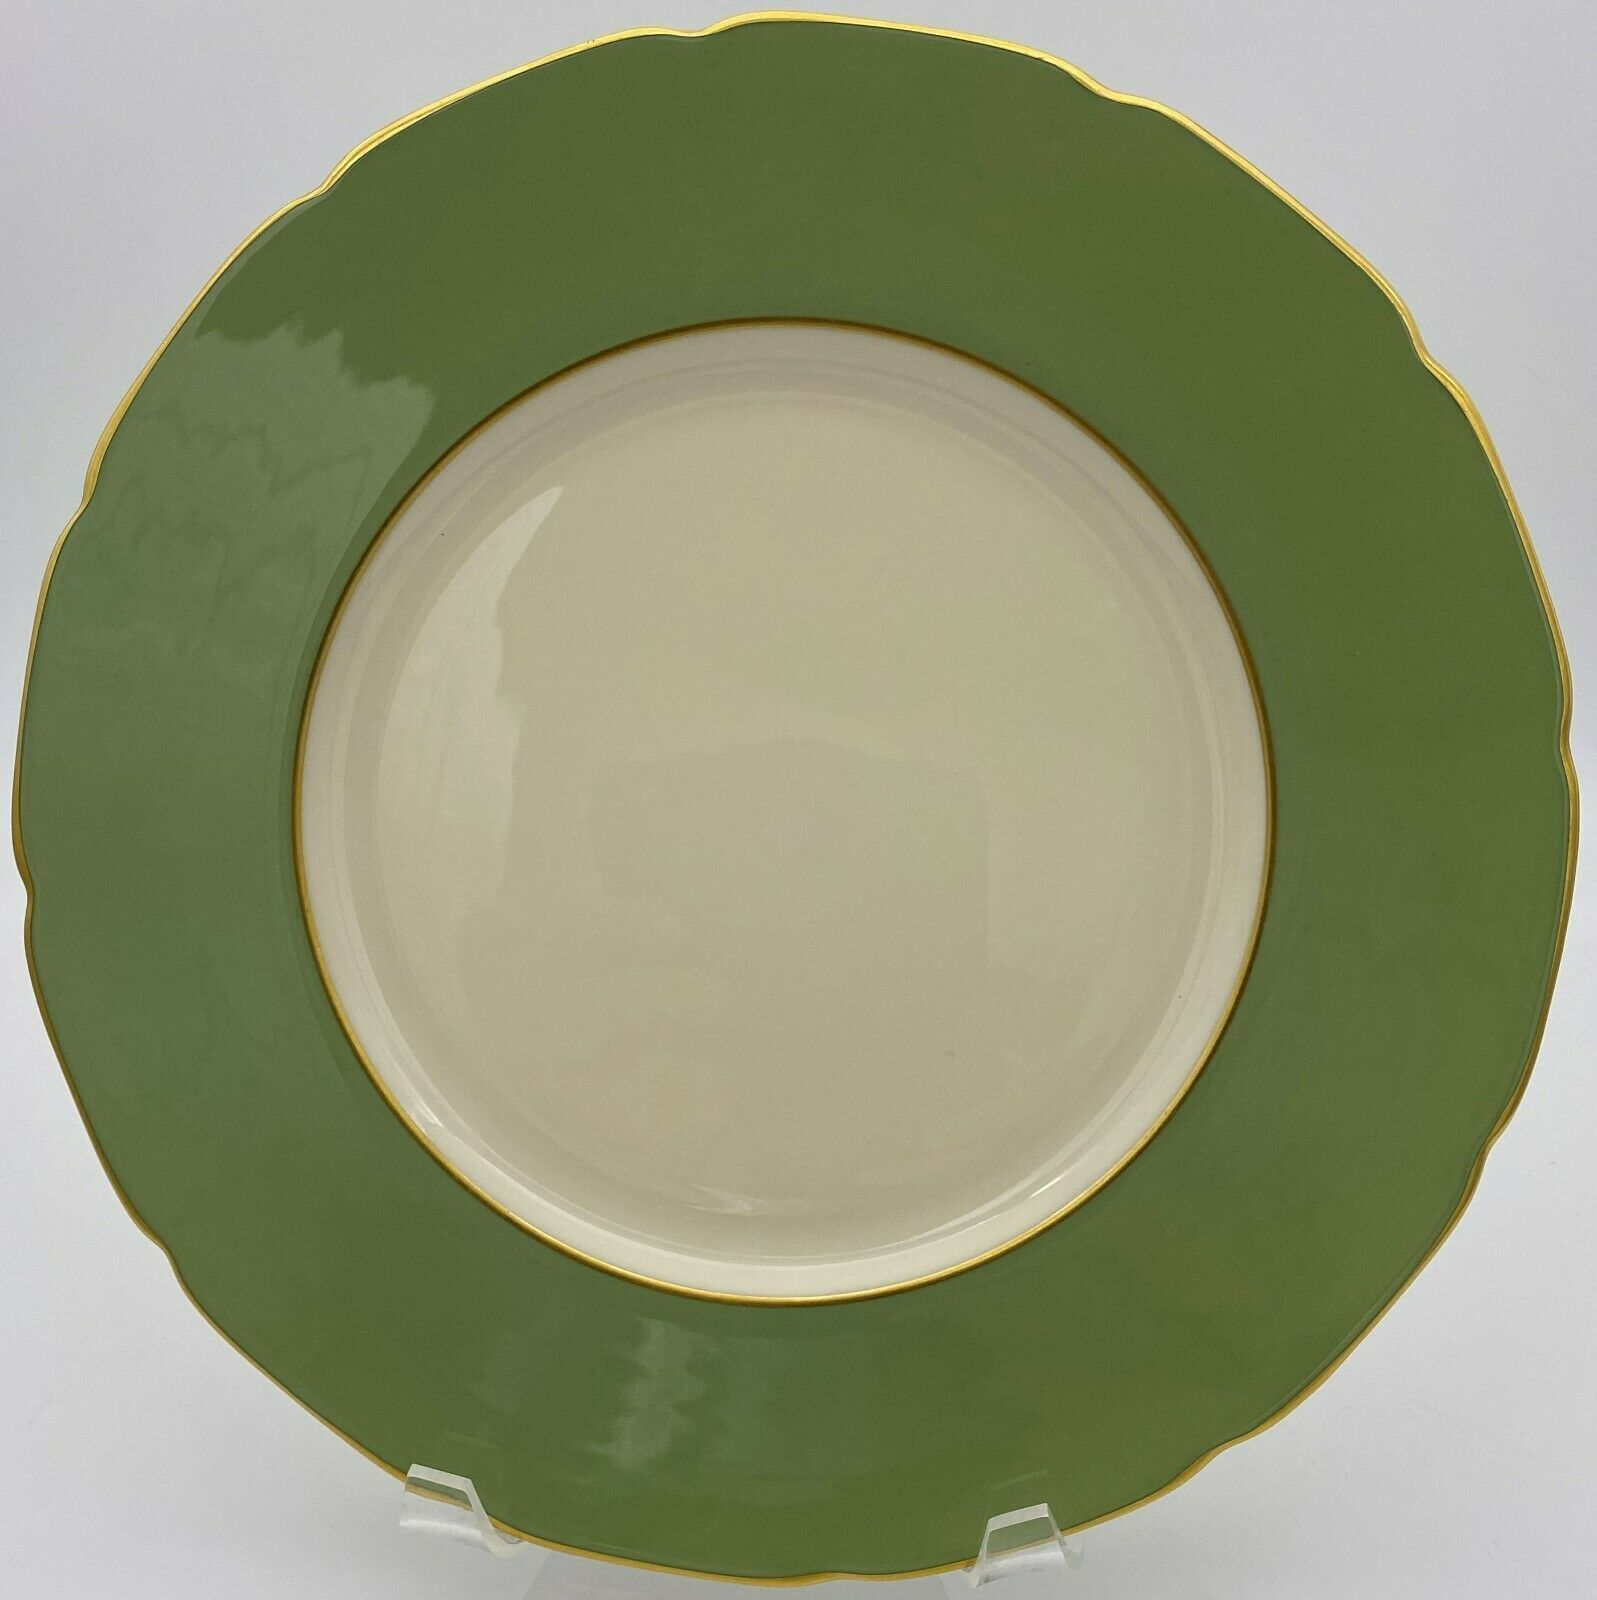 Lenox 1445/046X30-1 Celadon Dinner plate - $35.00